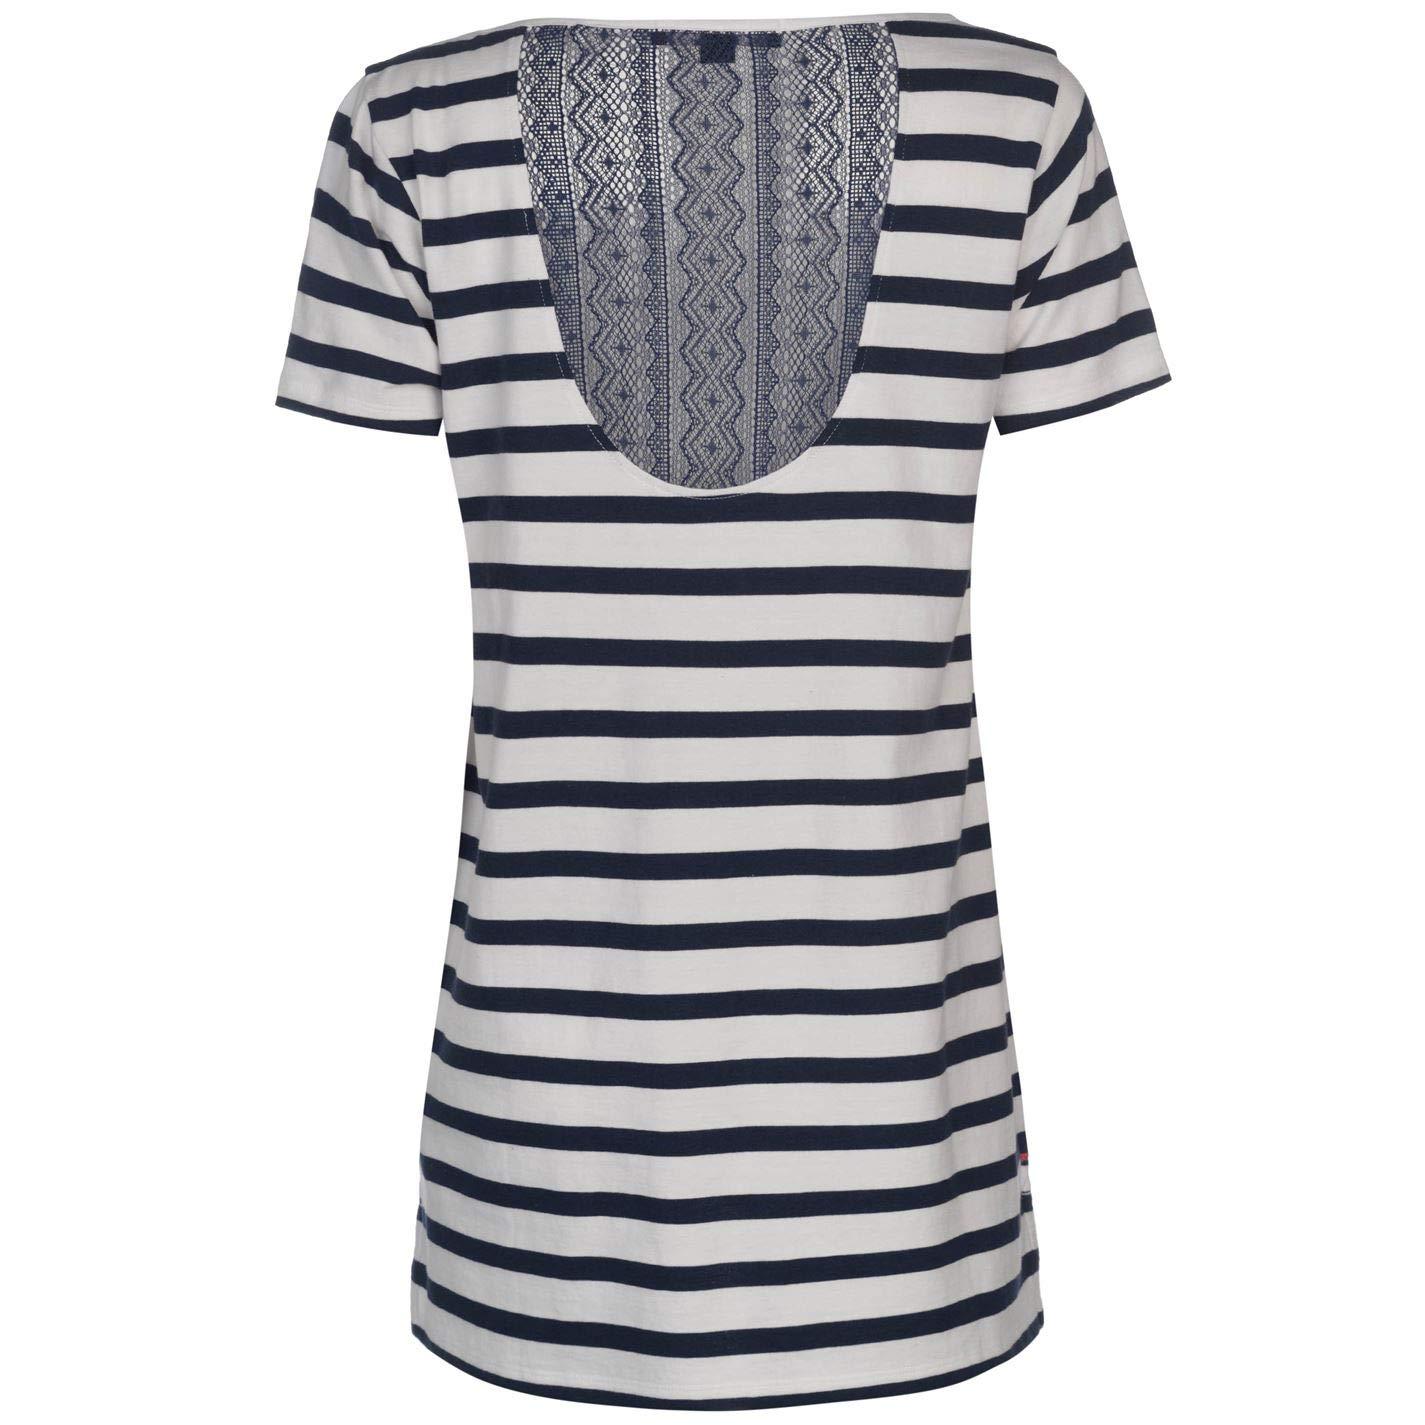 a572c16e Kangol Womens Lace Back T Shirt Navy Stripe 16 (XL): Amazon.co.uk: Clothing